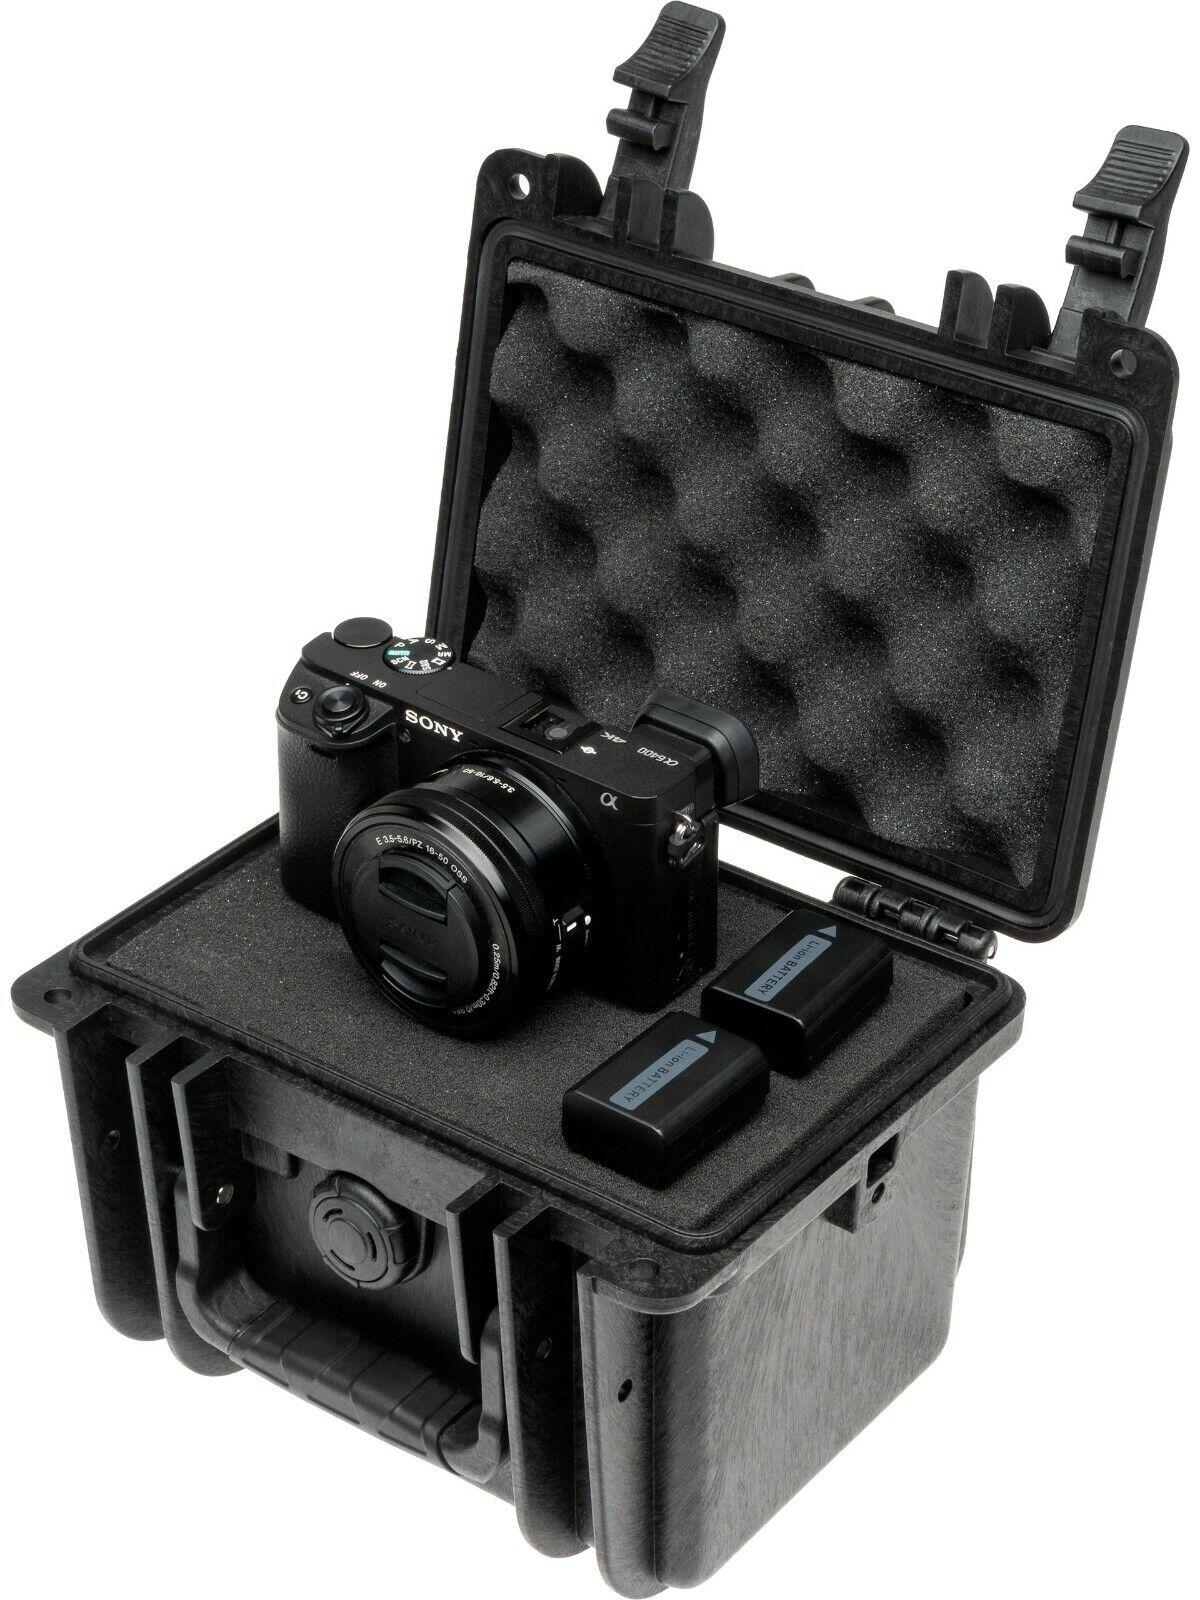 Waterproof Portable Camera Case With Handle (19.30 x 17.20 x 14.20cm)(No. 318)